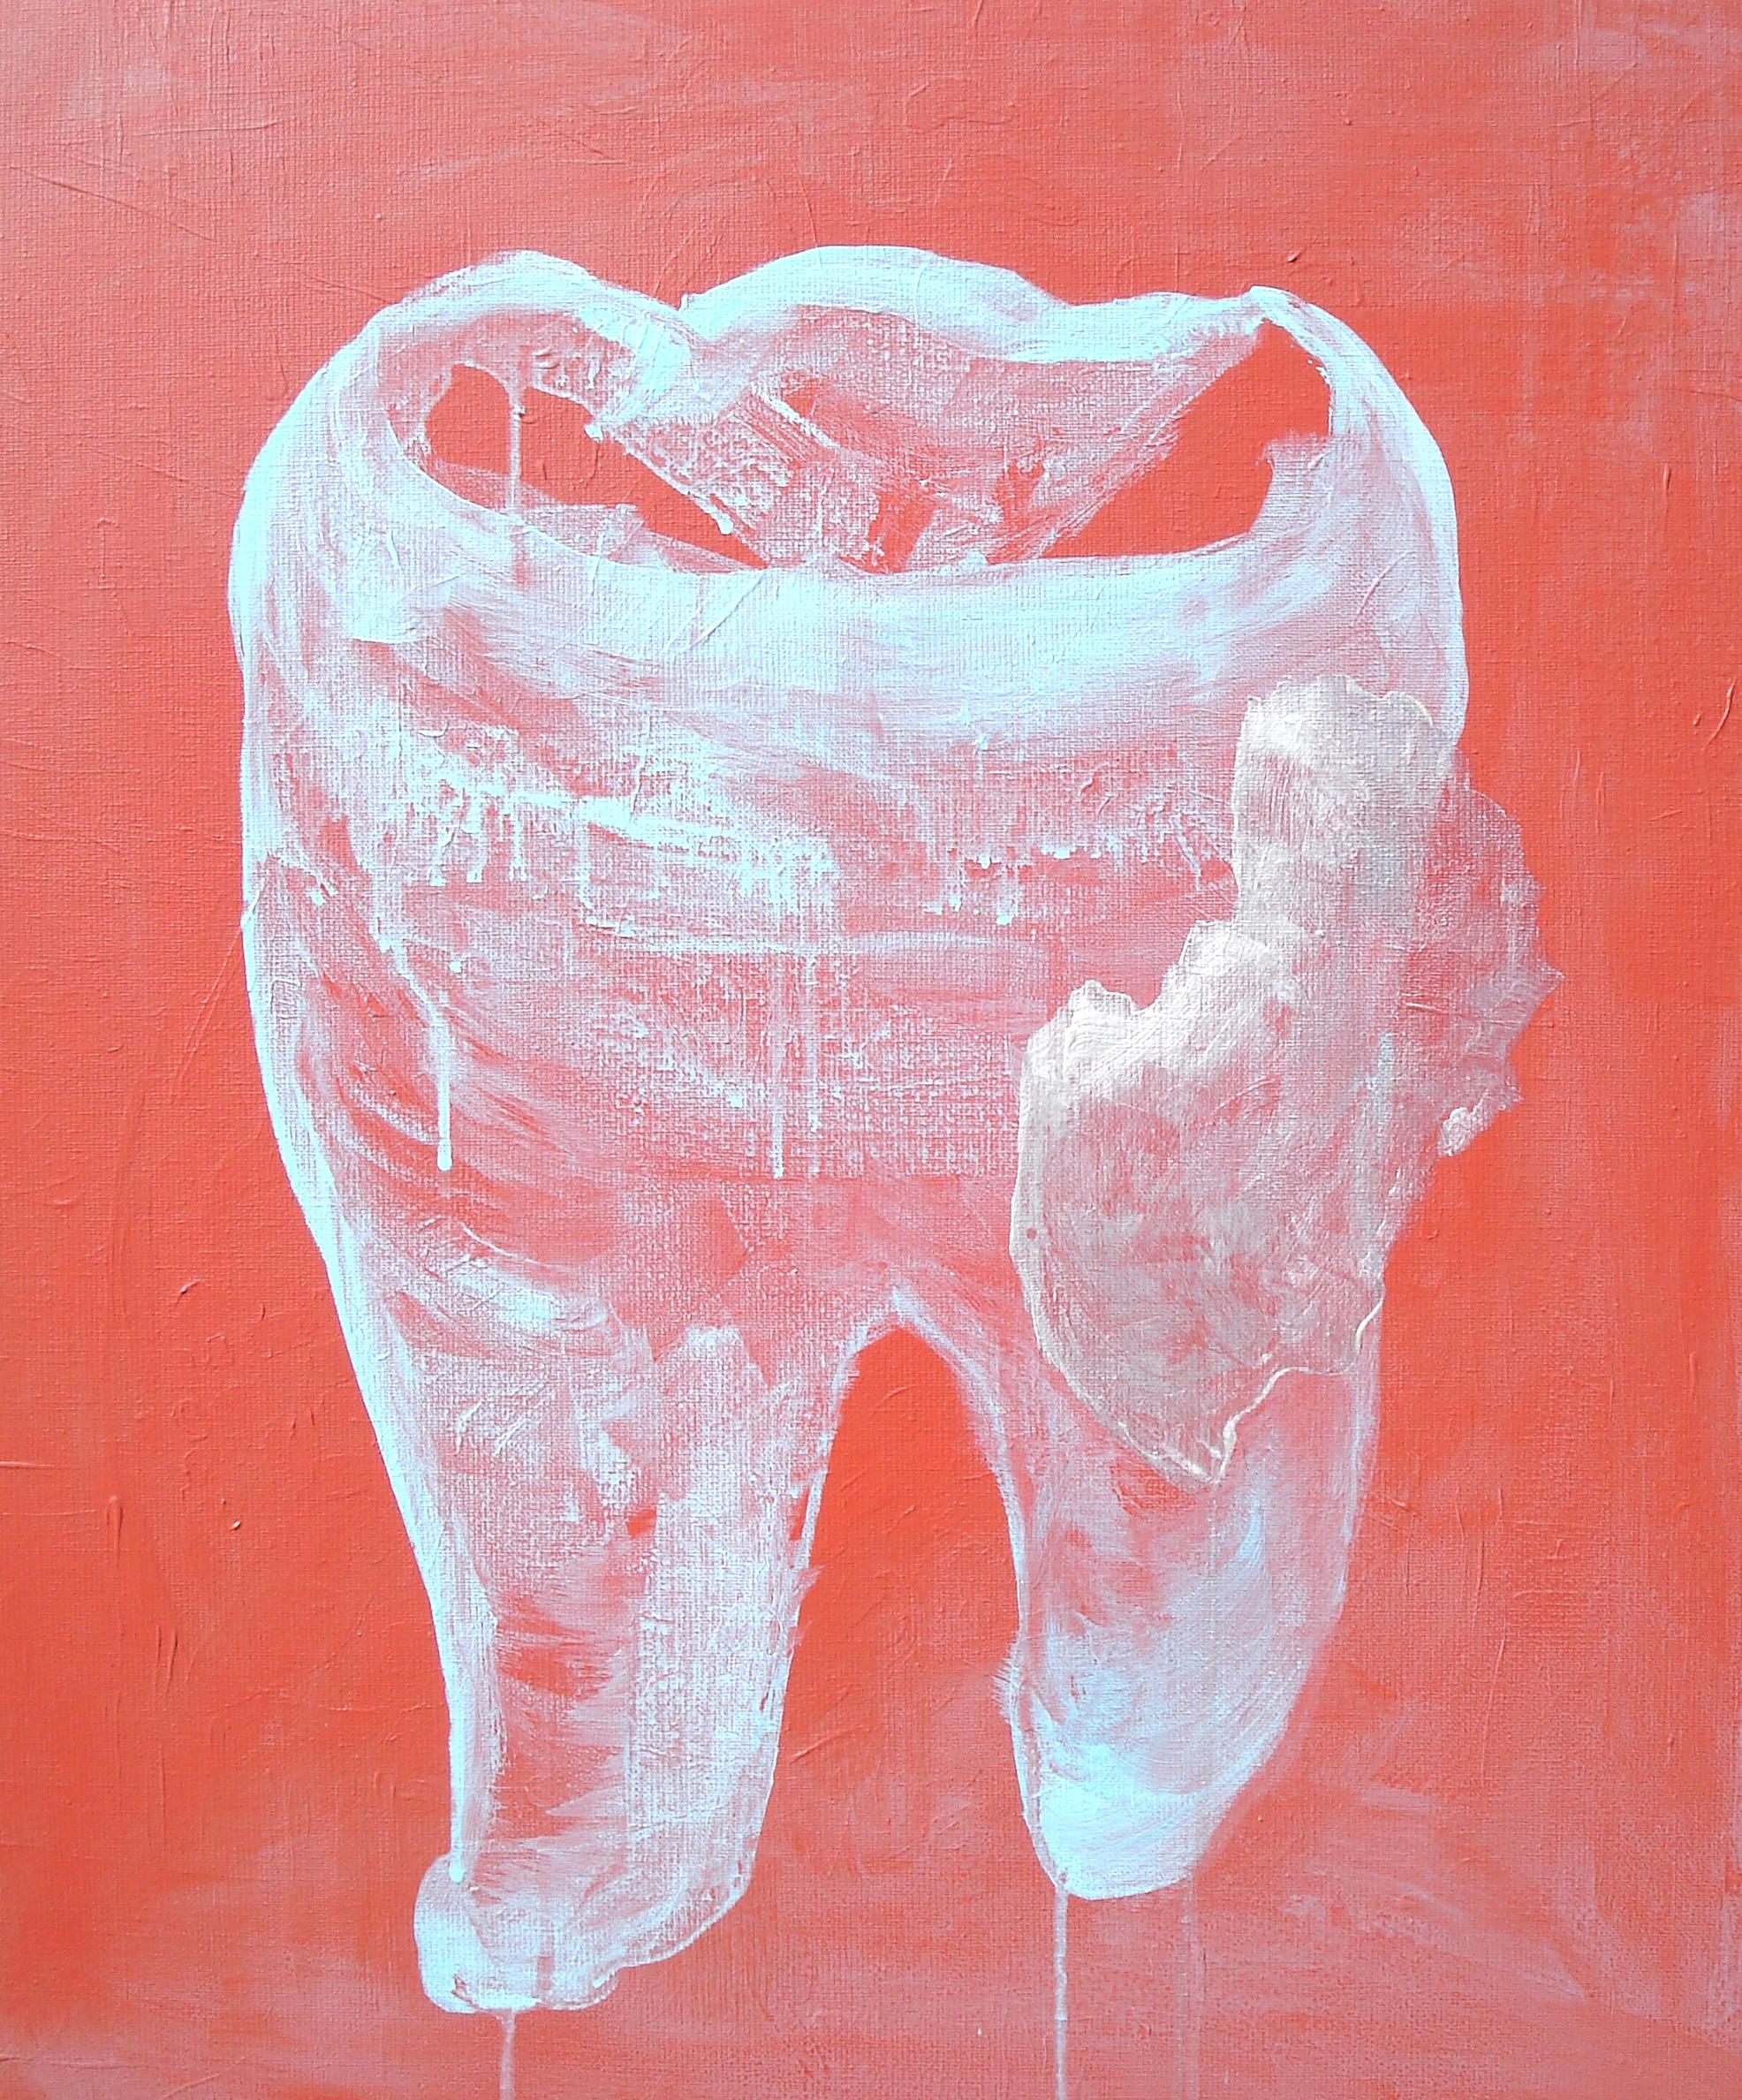 Molare2015Acrylic-on-linen-50-cm-x-60-cm